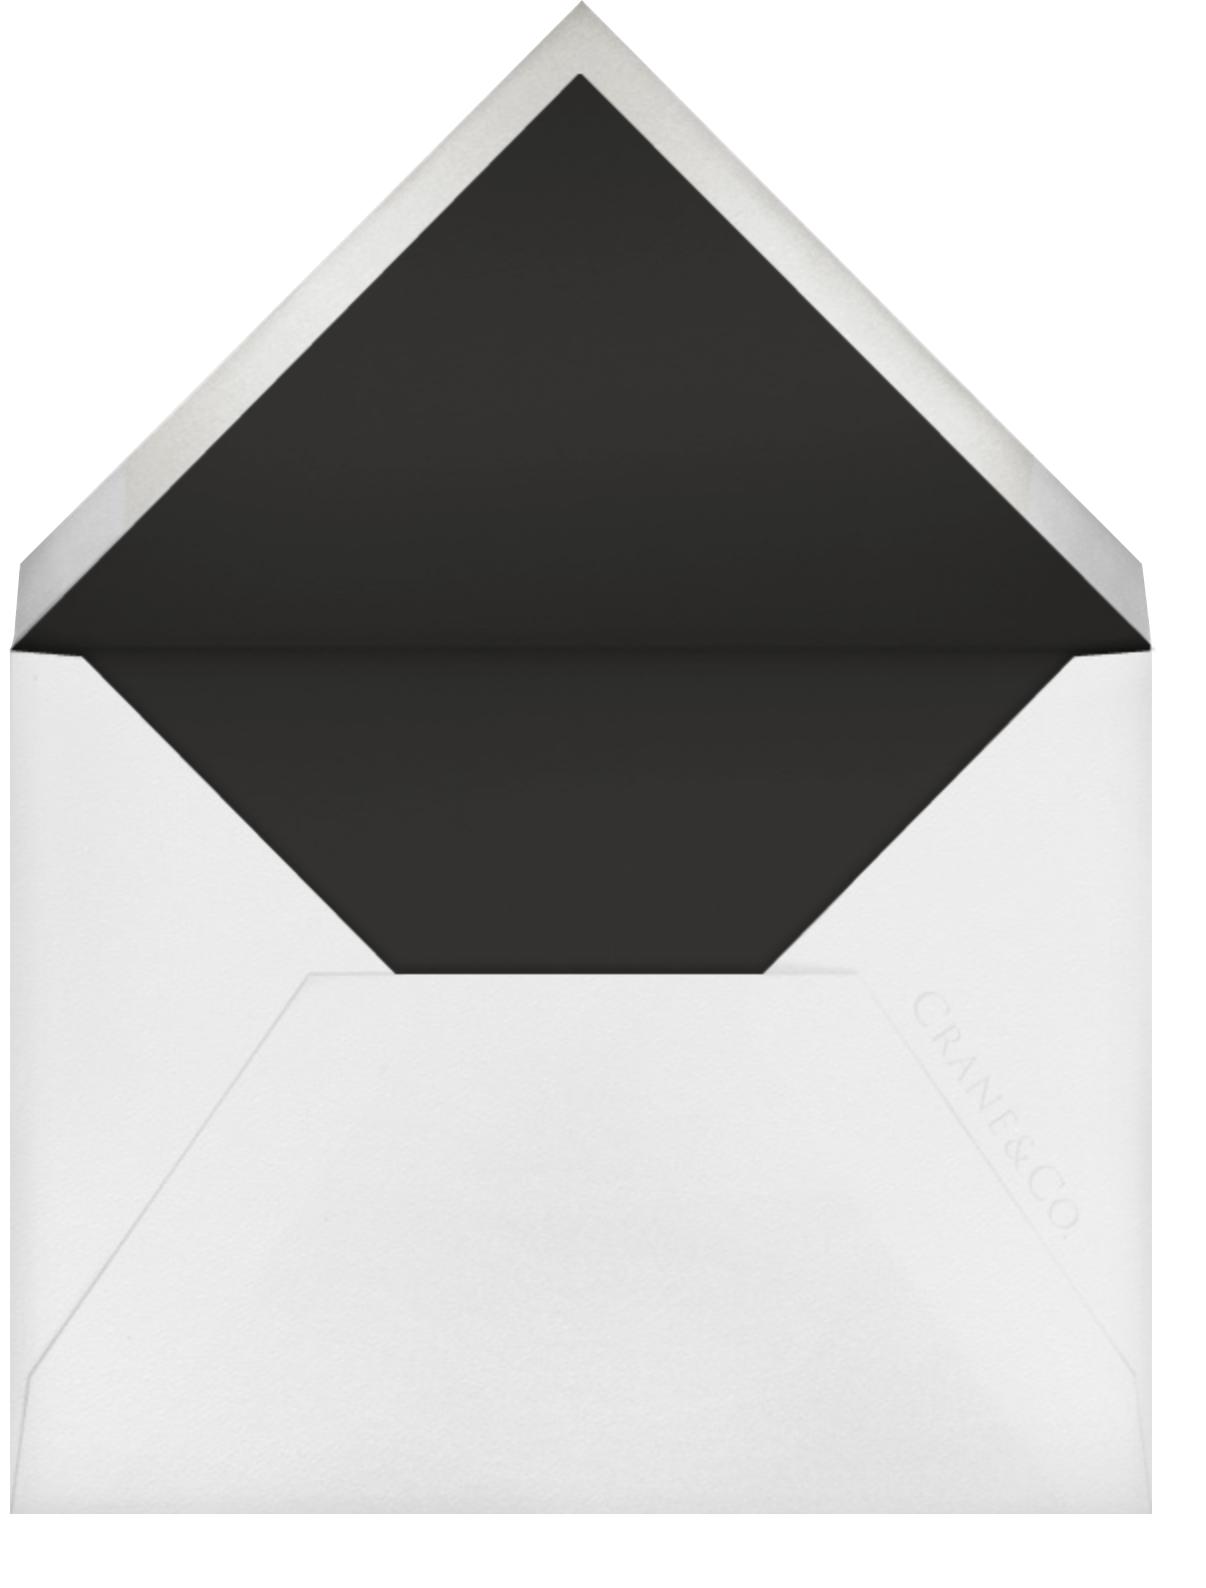 Love Knots (Thank You) - Black - Oscar de la Renta - Personalized stationery - envelope back